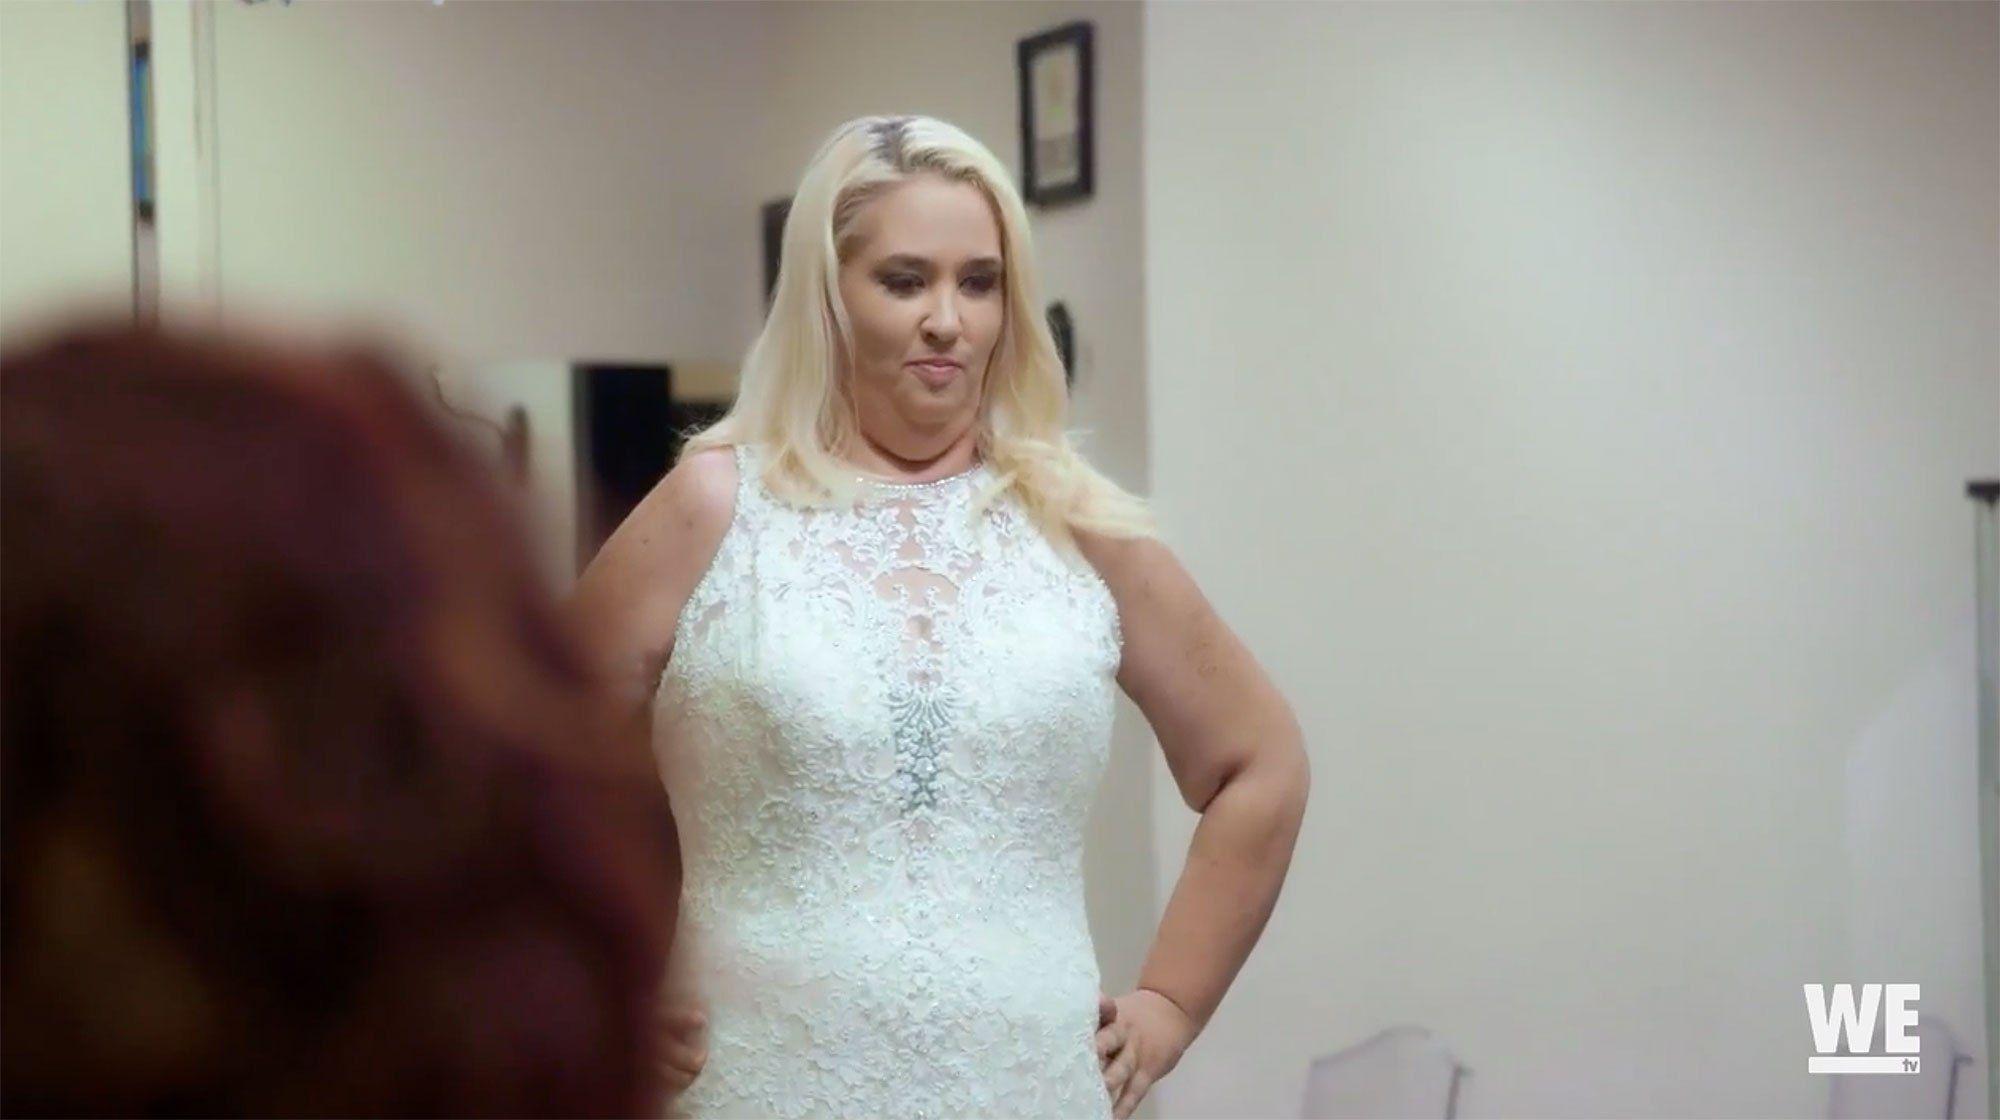 Mama june wedding dress  Dramatically Slimmed Down Mama June Tries On a Wedding Dress